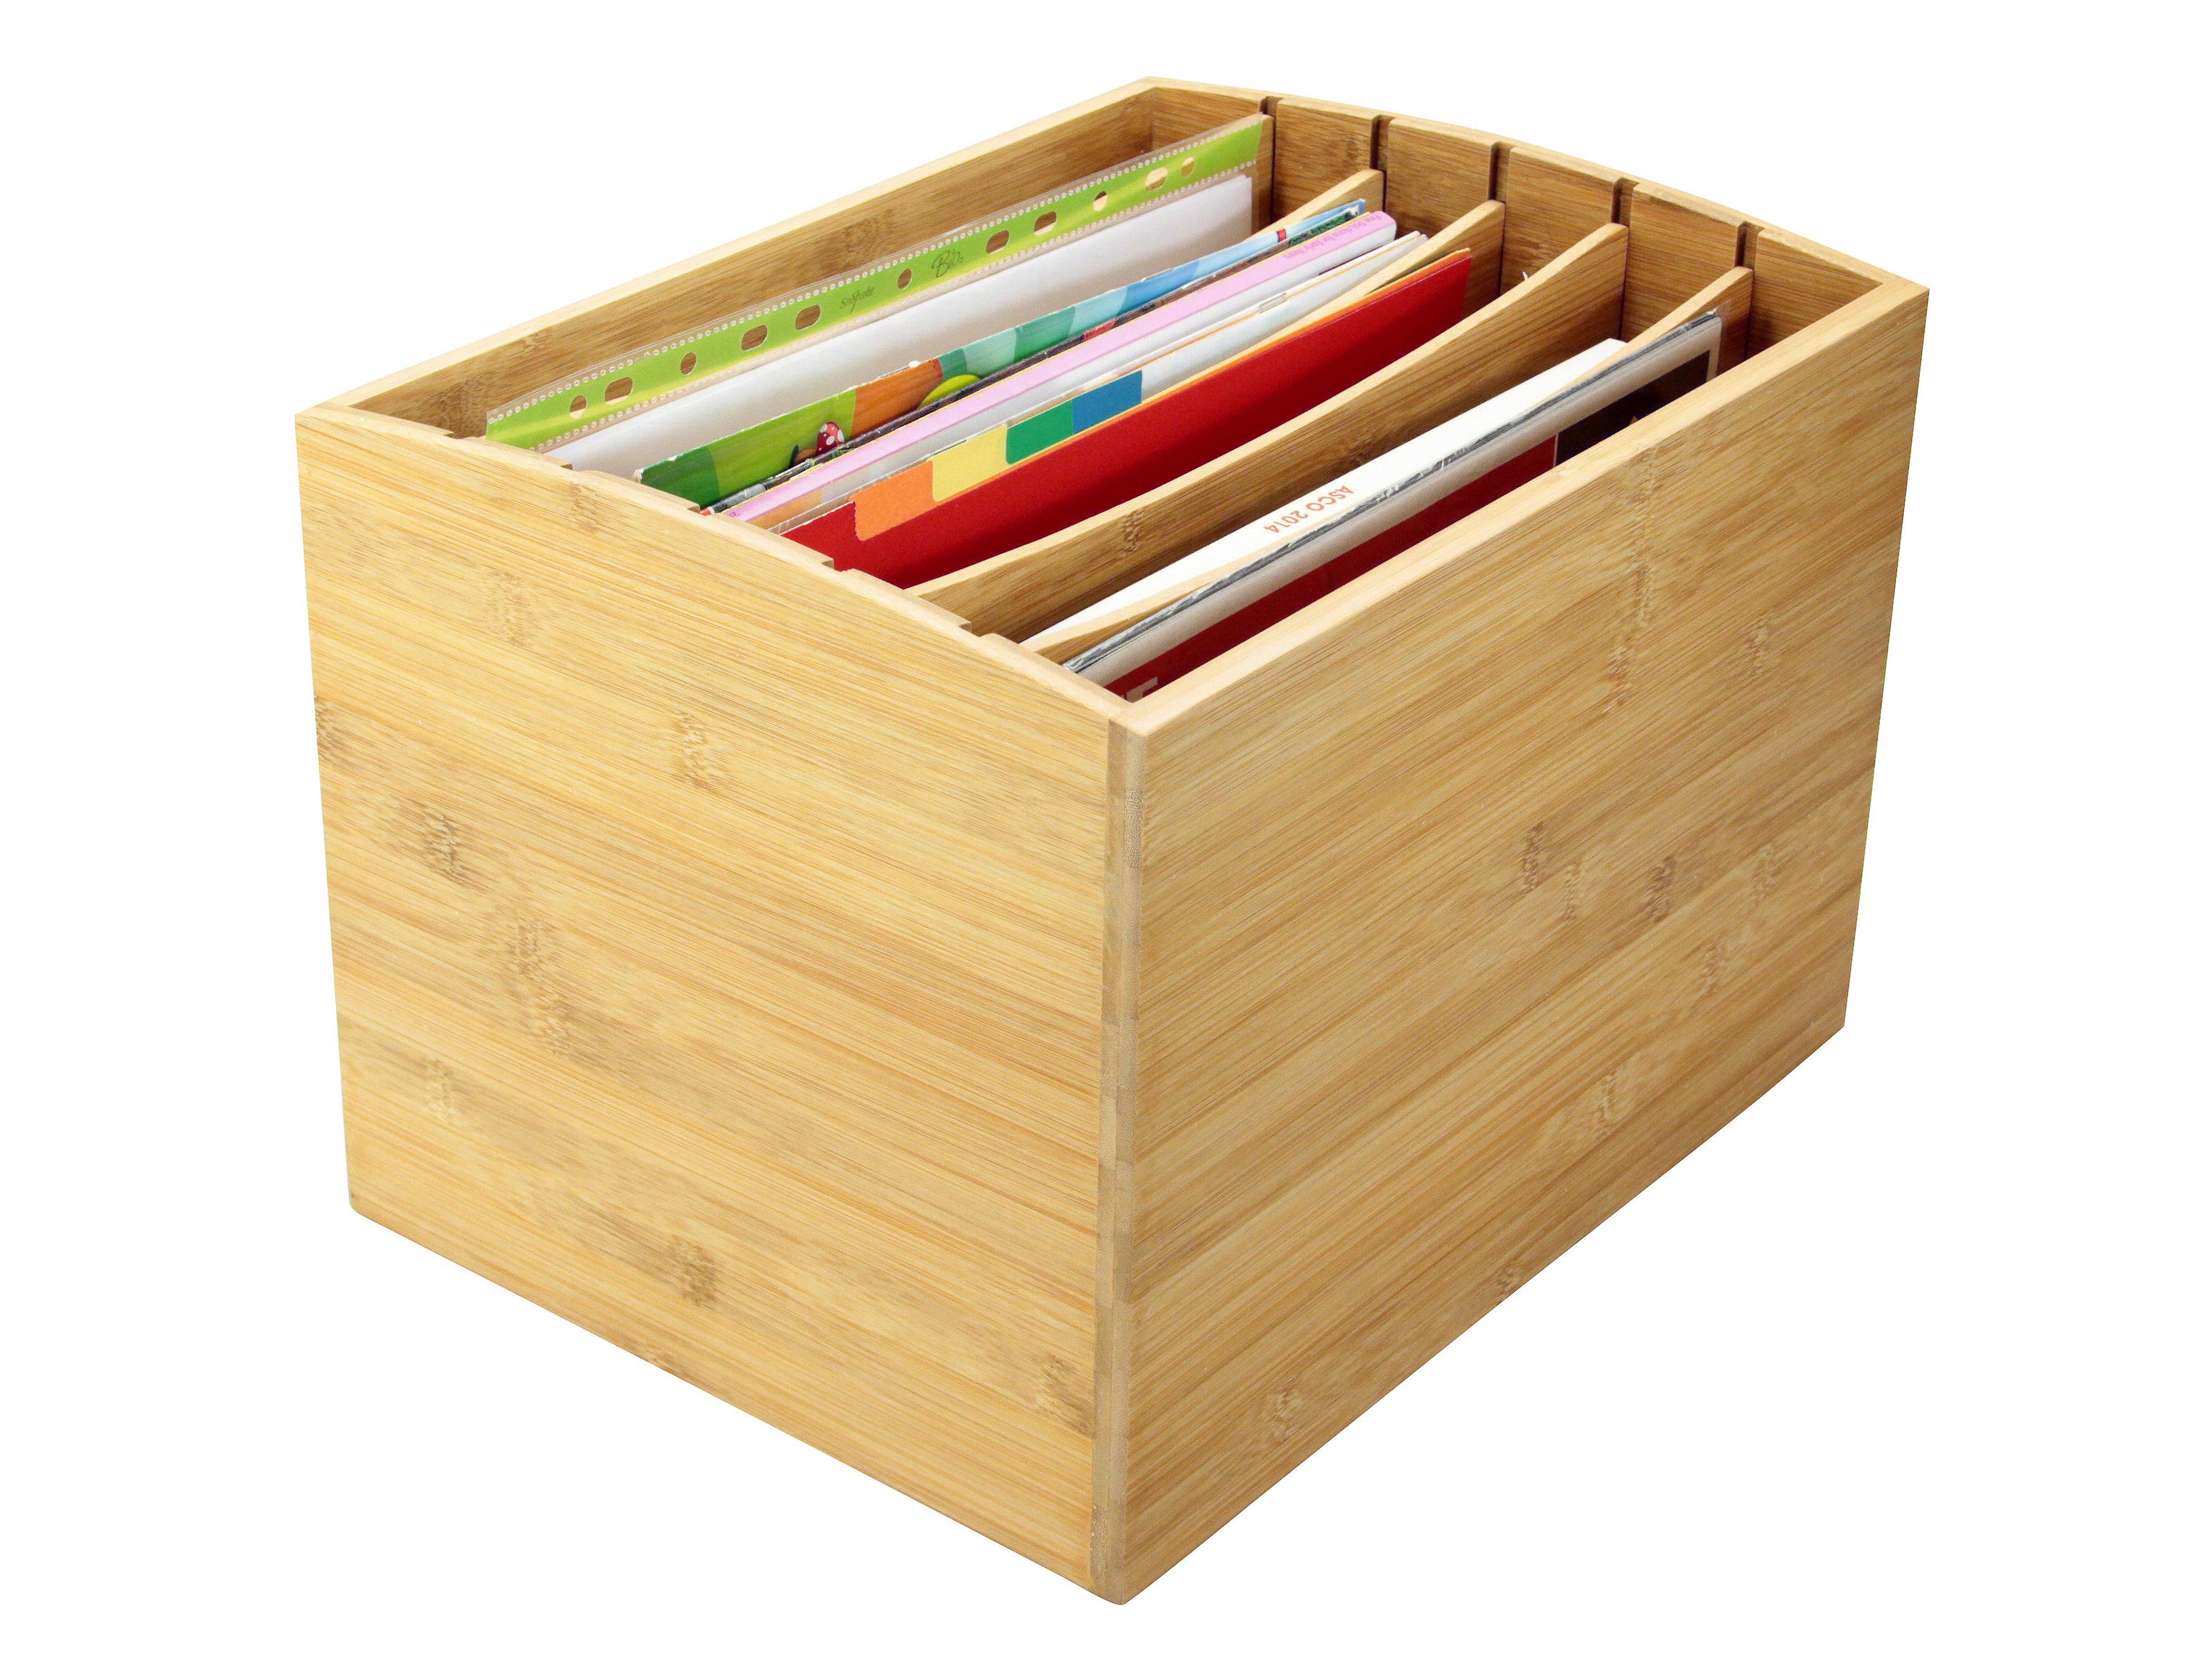 Woodquail Bamboo Desktop Literature File Sorter A4 Document Organiser Storage